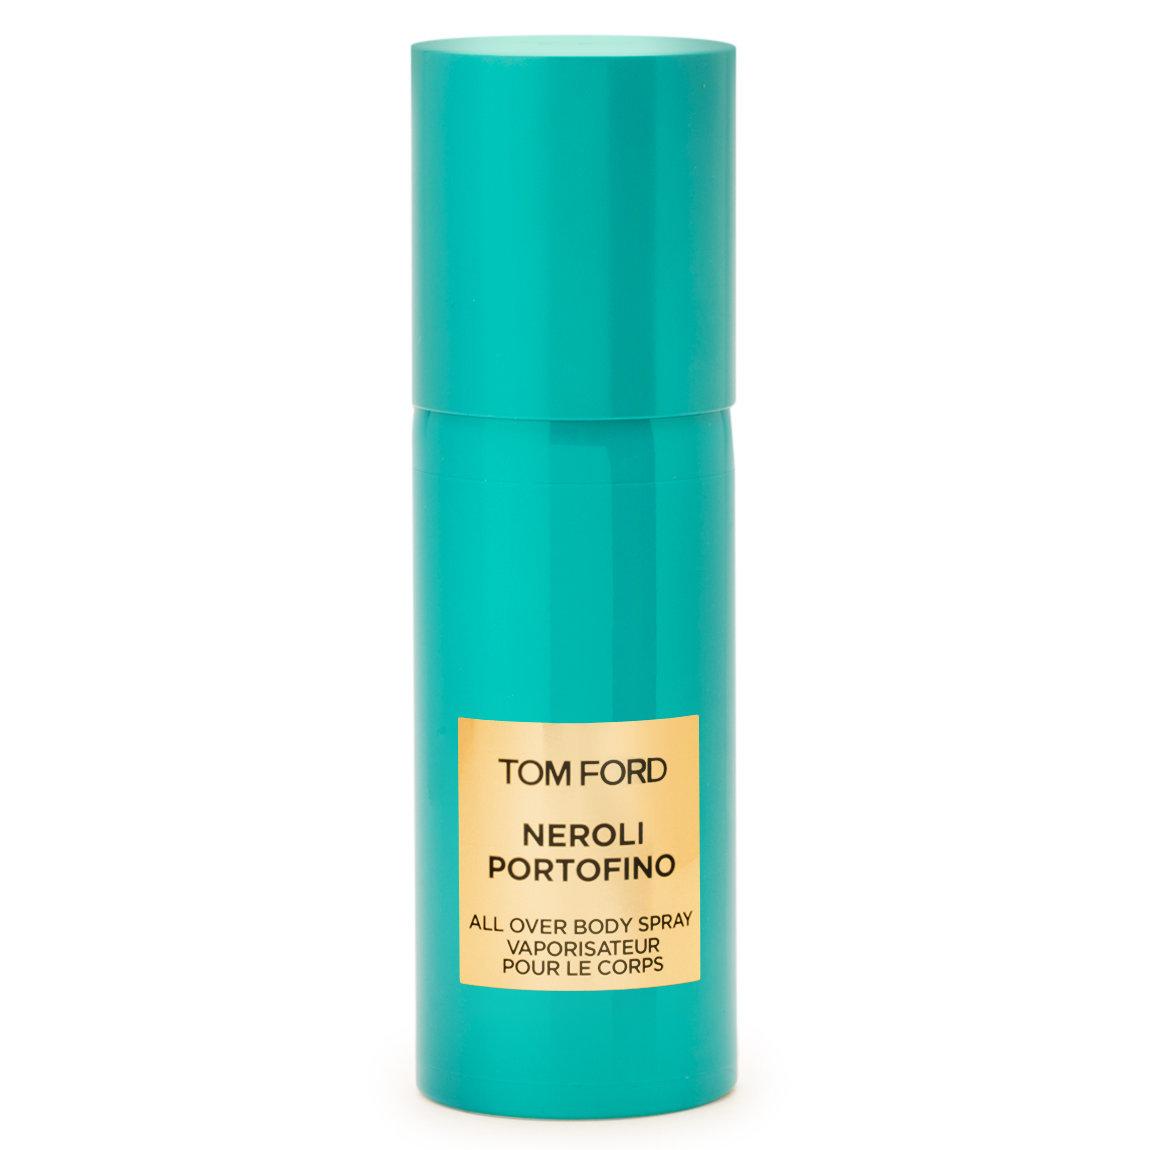 TOM FORD Neroli Portofino All Over Body Spray product swatch.